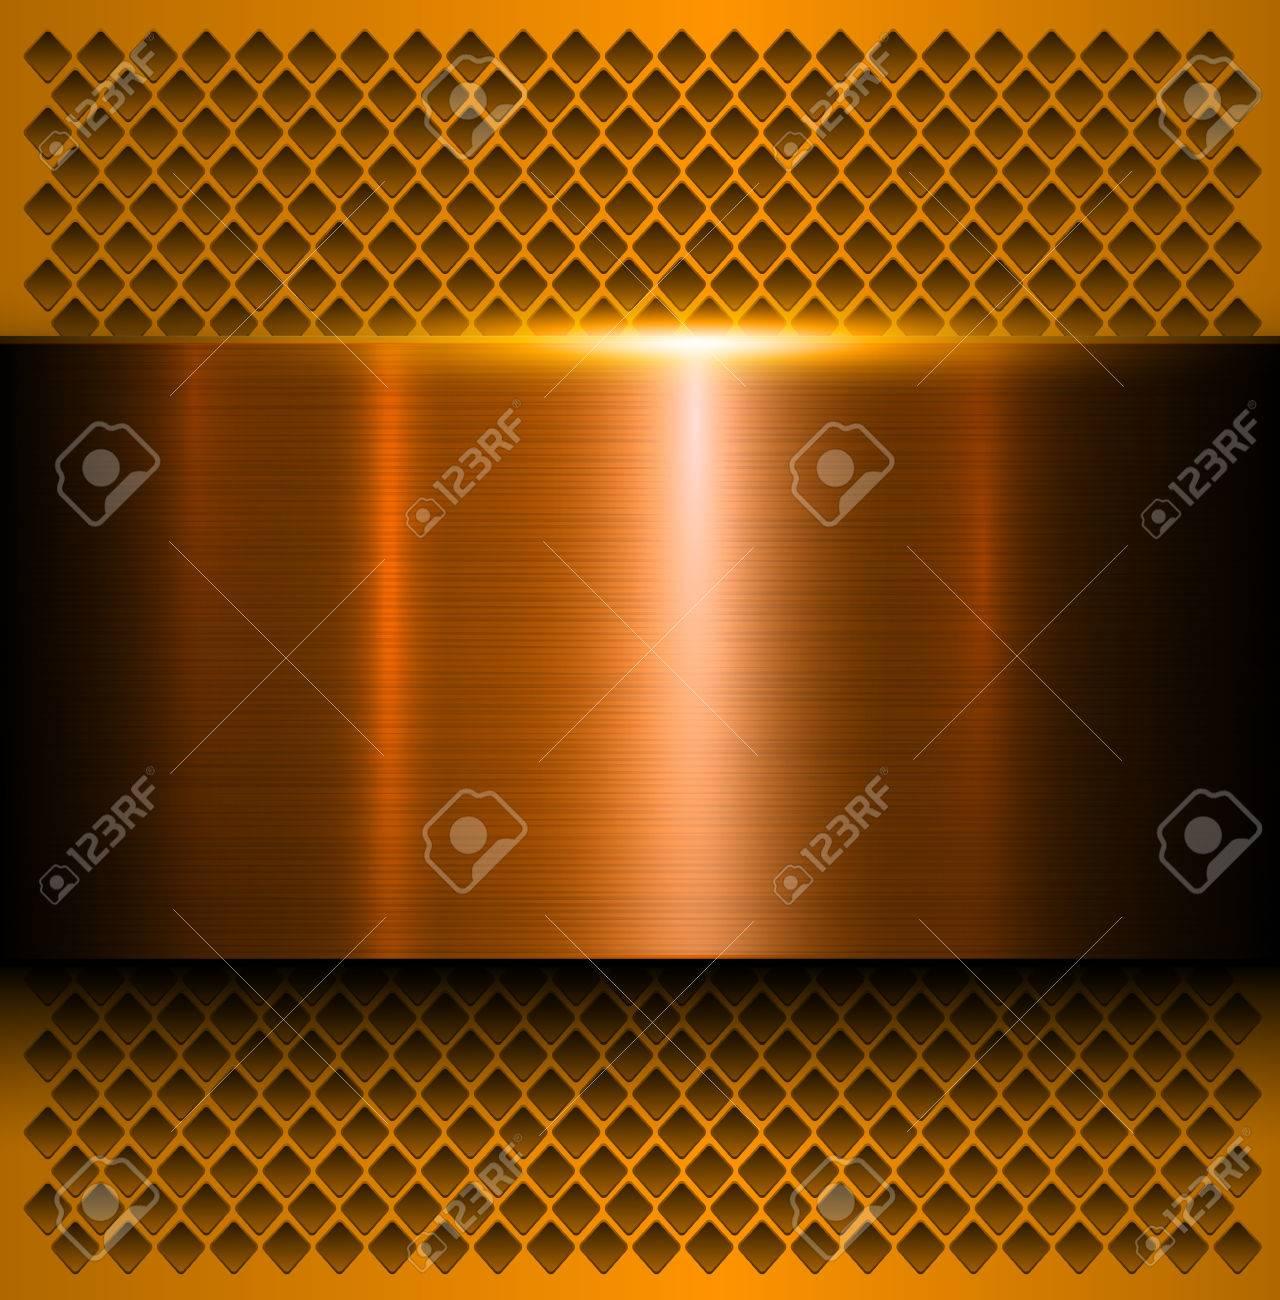 Metal background, polished metallic texture, vector illustration - 60080892